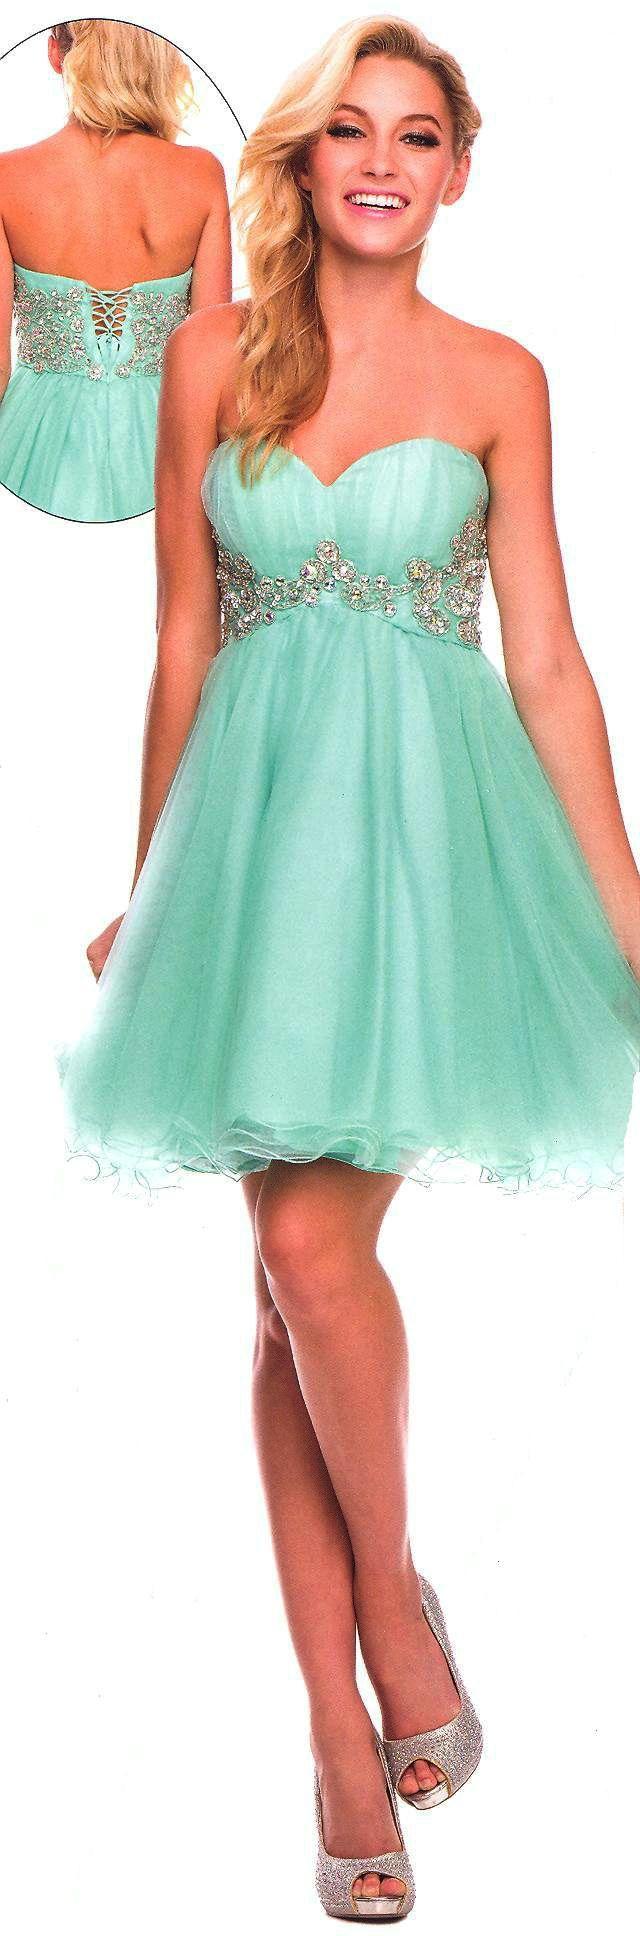 243 best Prom dresses❤ images on Pinterest | Dress prom ...